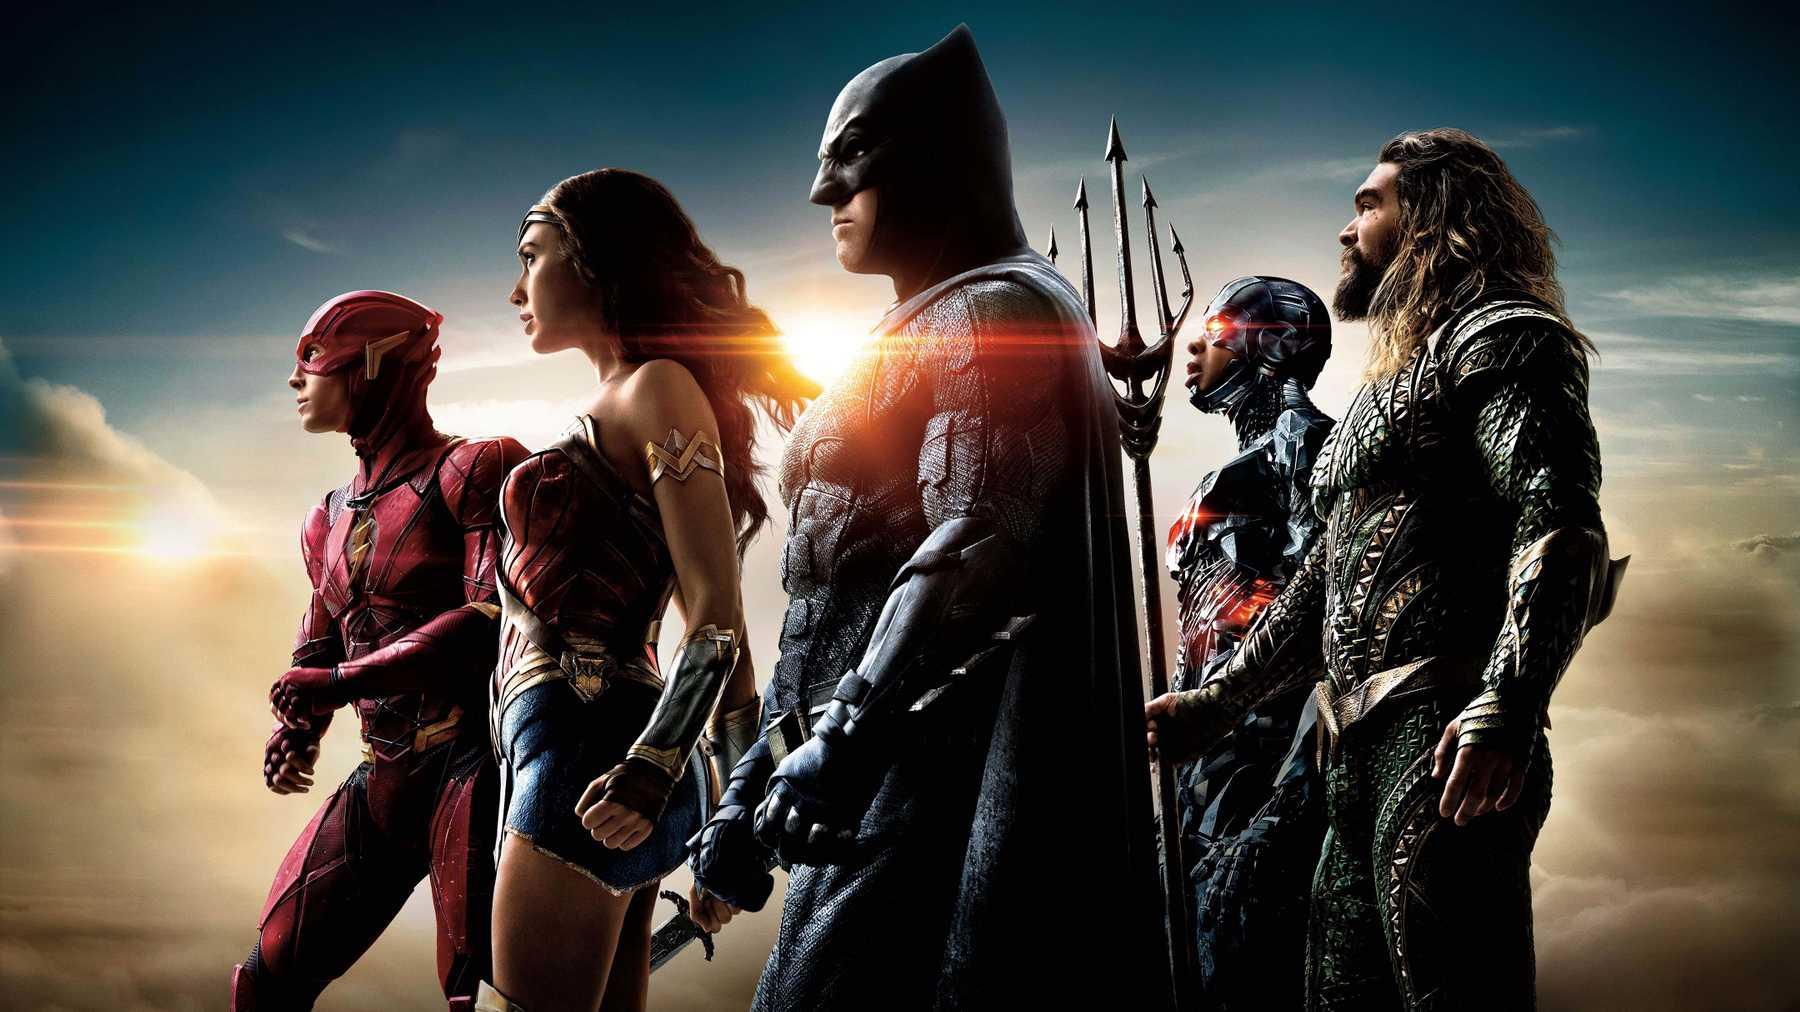 Justice-league-snyder-cut.jpg